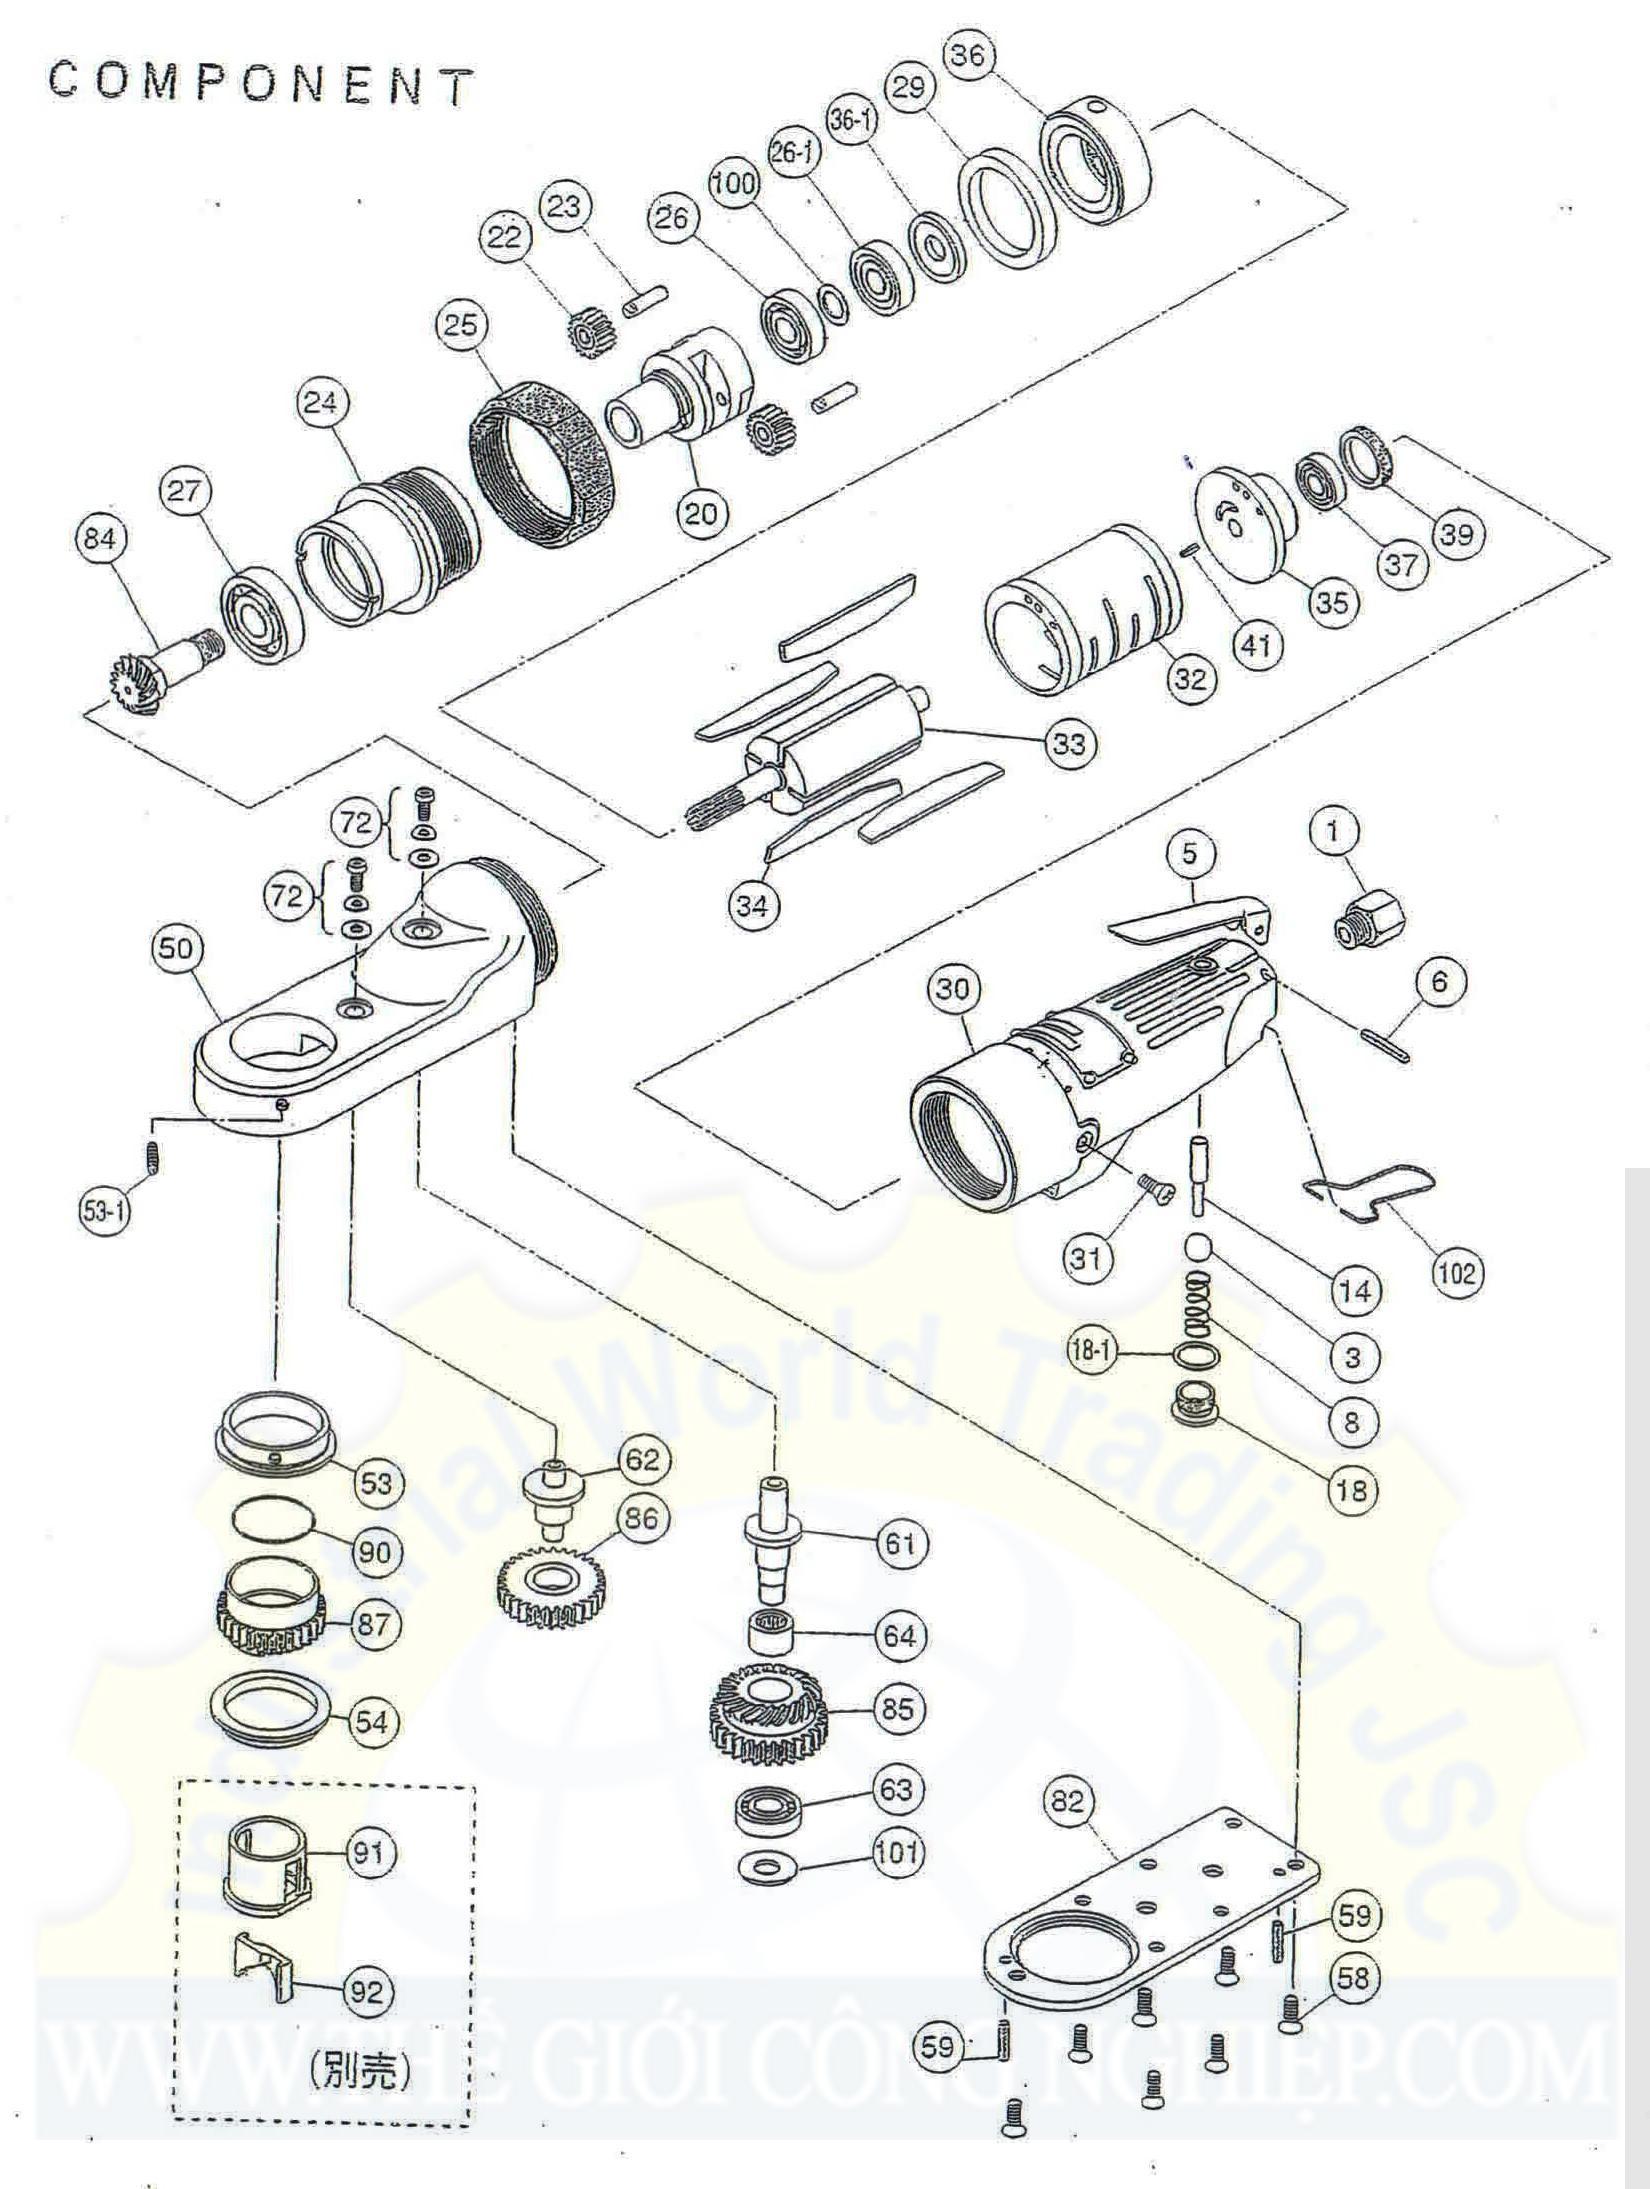 Idle gears Part No. 22 Meiku